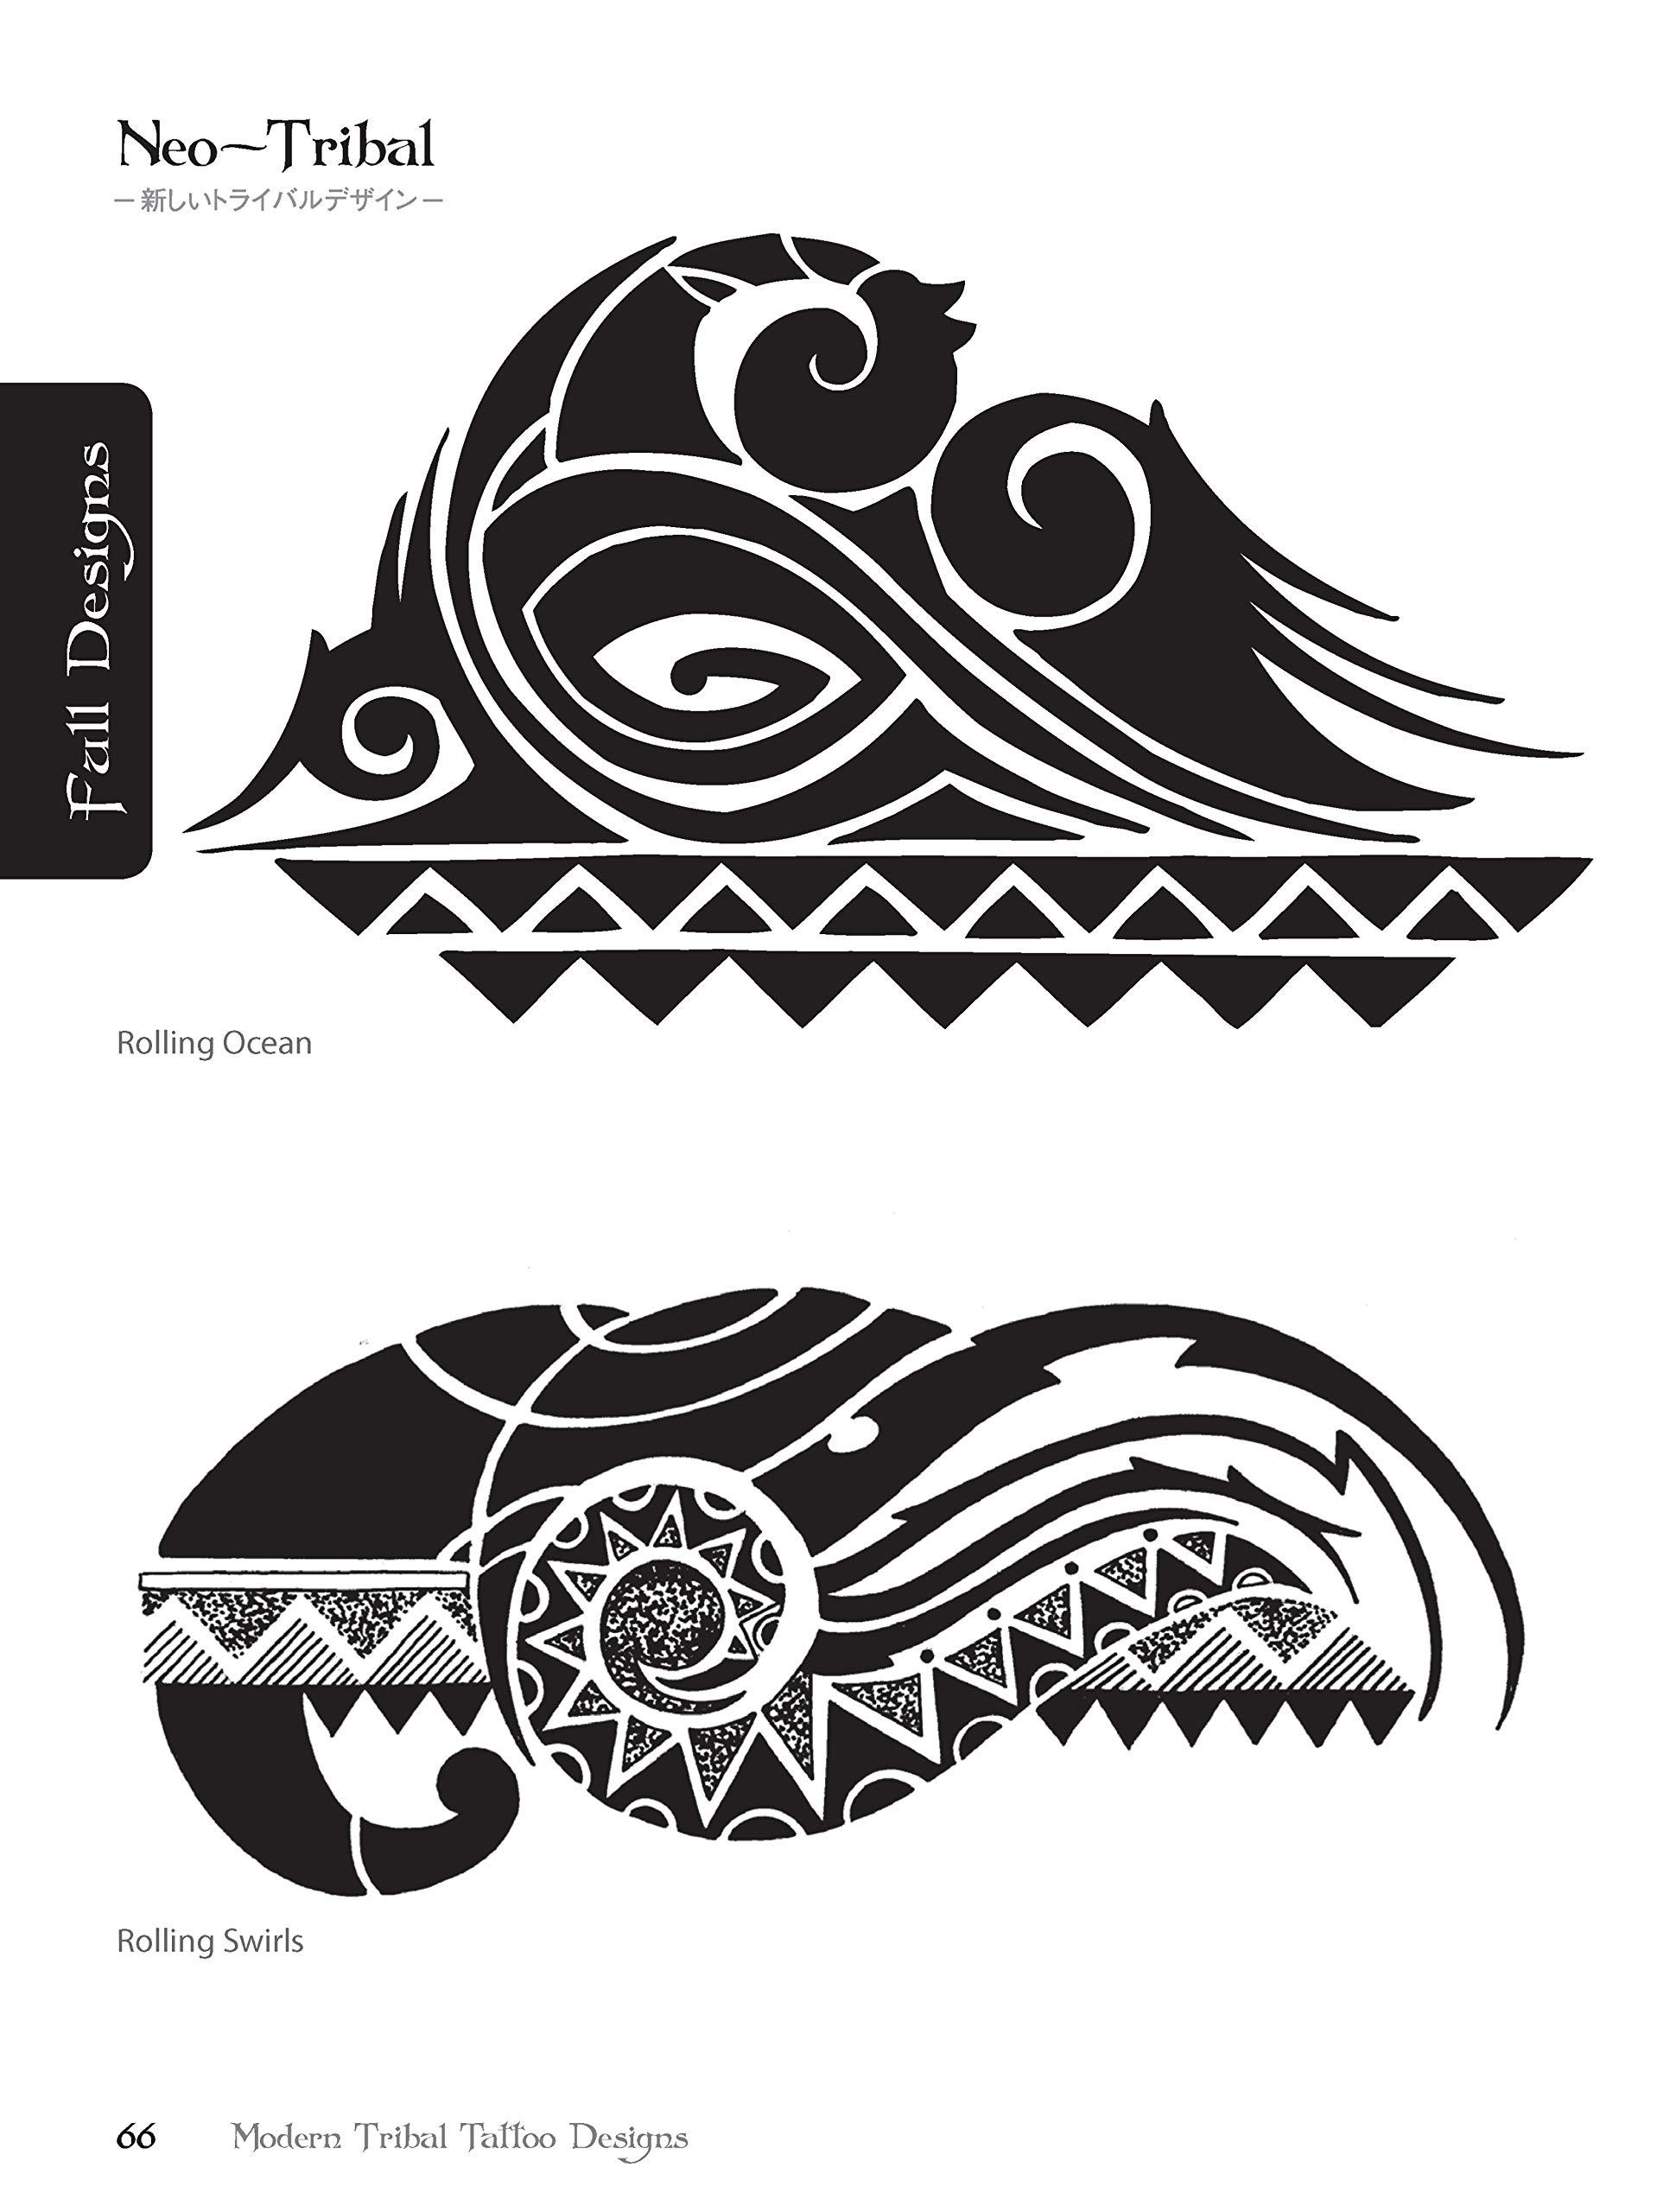 f436423726de7 Buy Modern Tribal Tattoo Designs Book Online at Low Prices in India | Modern  Tribal Tattoo Designs Reviews & Ratings - Amazon.in